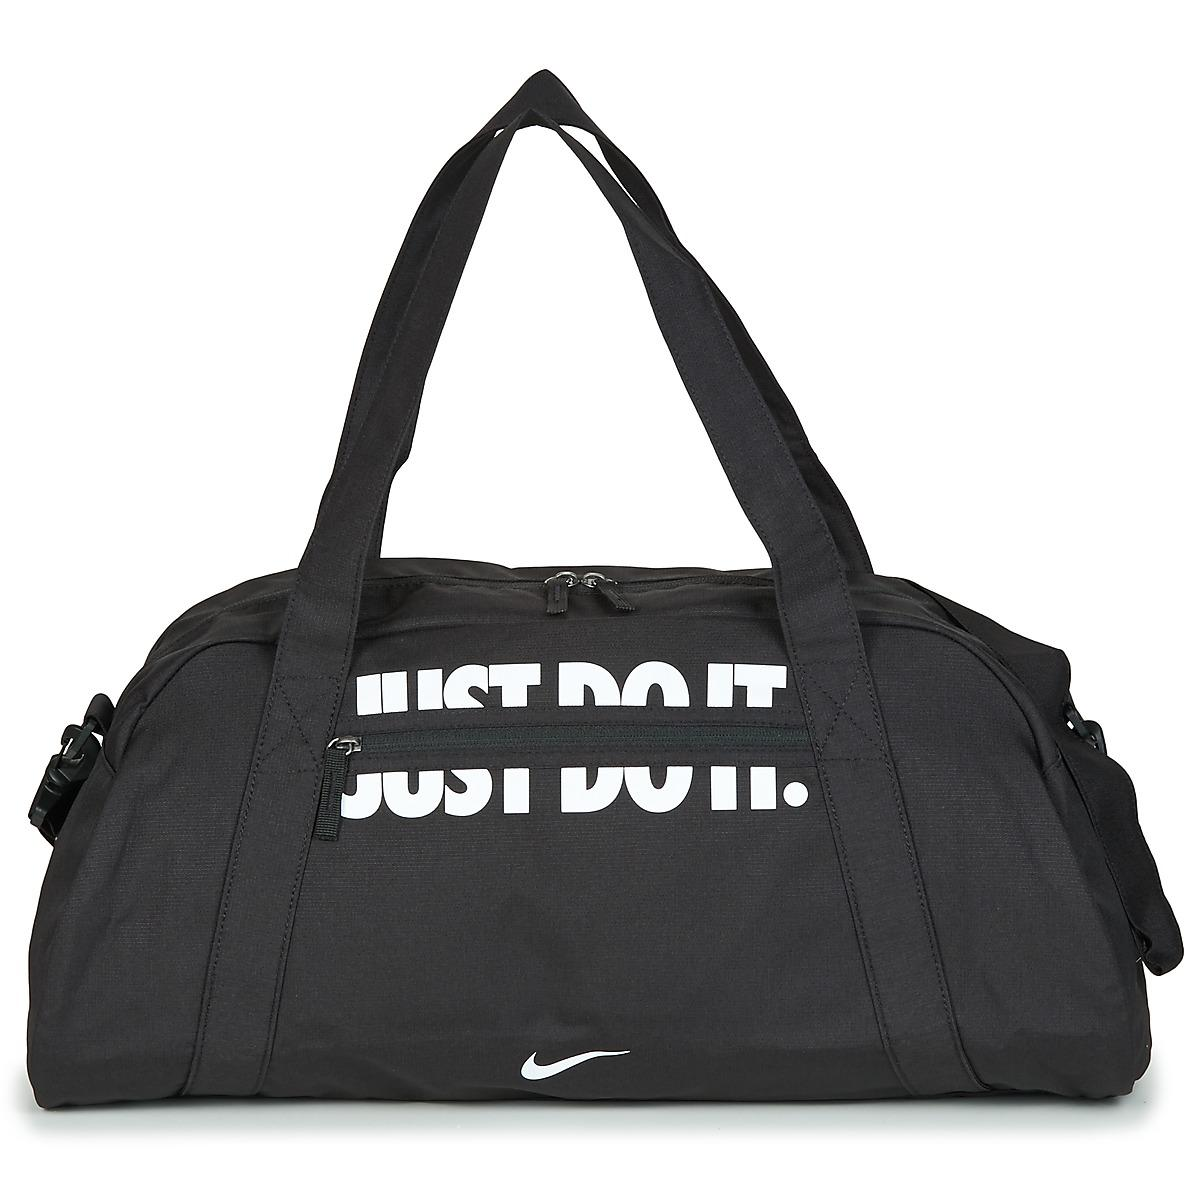 Nike Men S Handbags Sports ราคา - Handbag Photos Eleventyone.Org a819f5e1b2b89